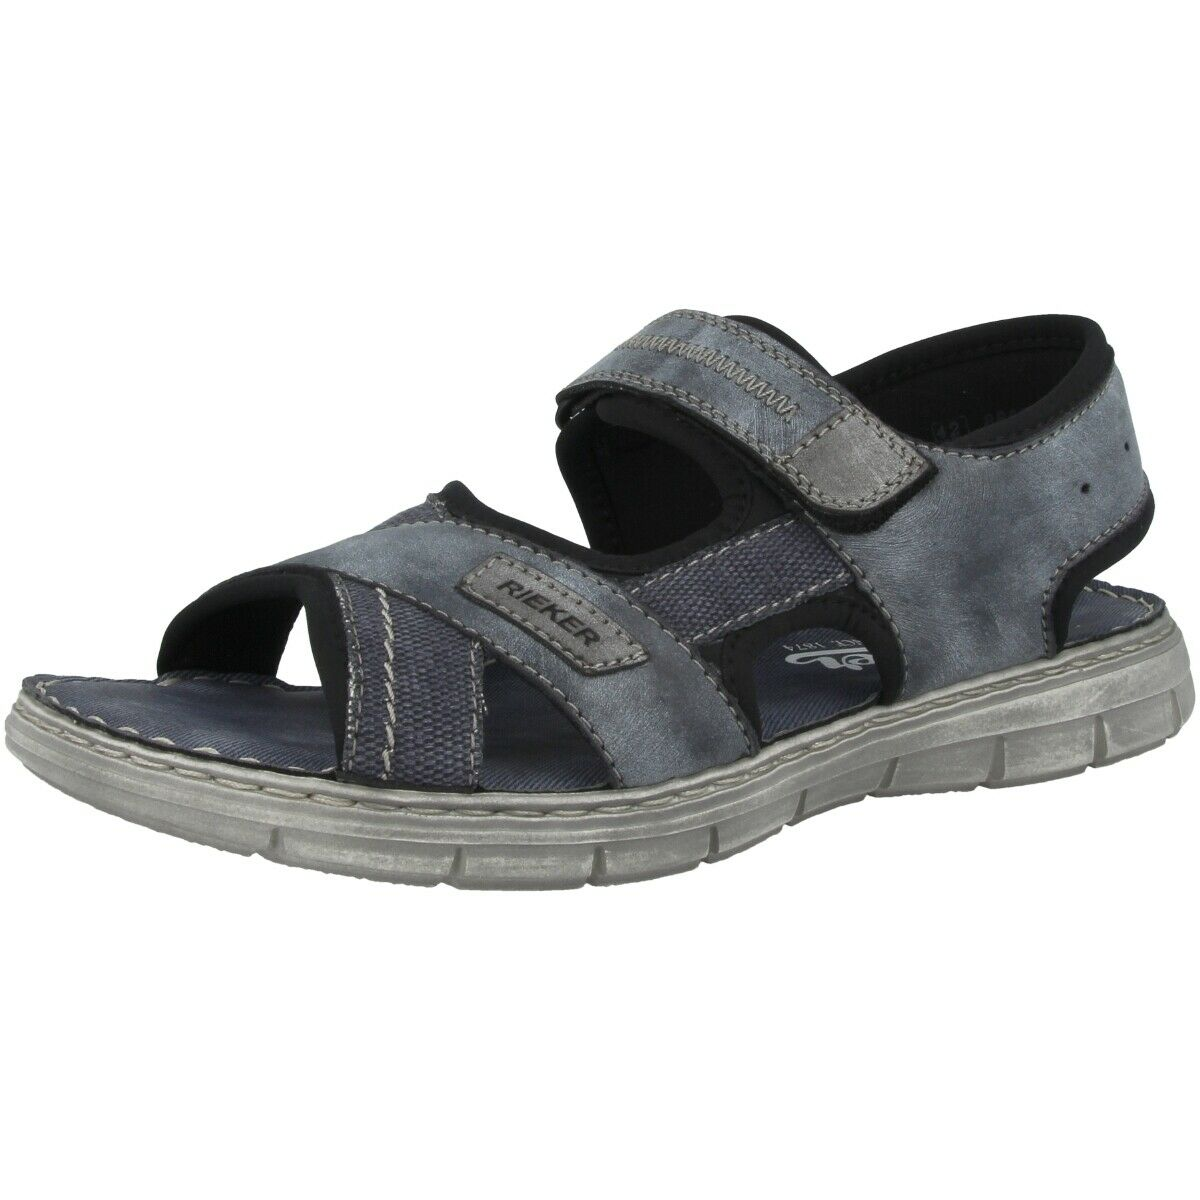 Rieker Fabric-SERBIA-SERBIA-Scuba High-heeled Sandals Anti-Stress shoes